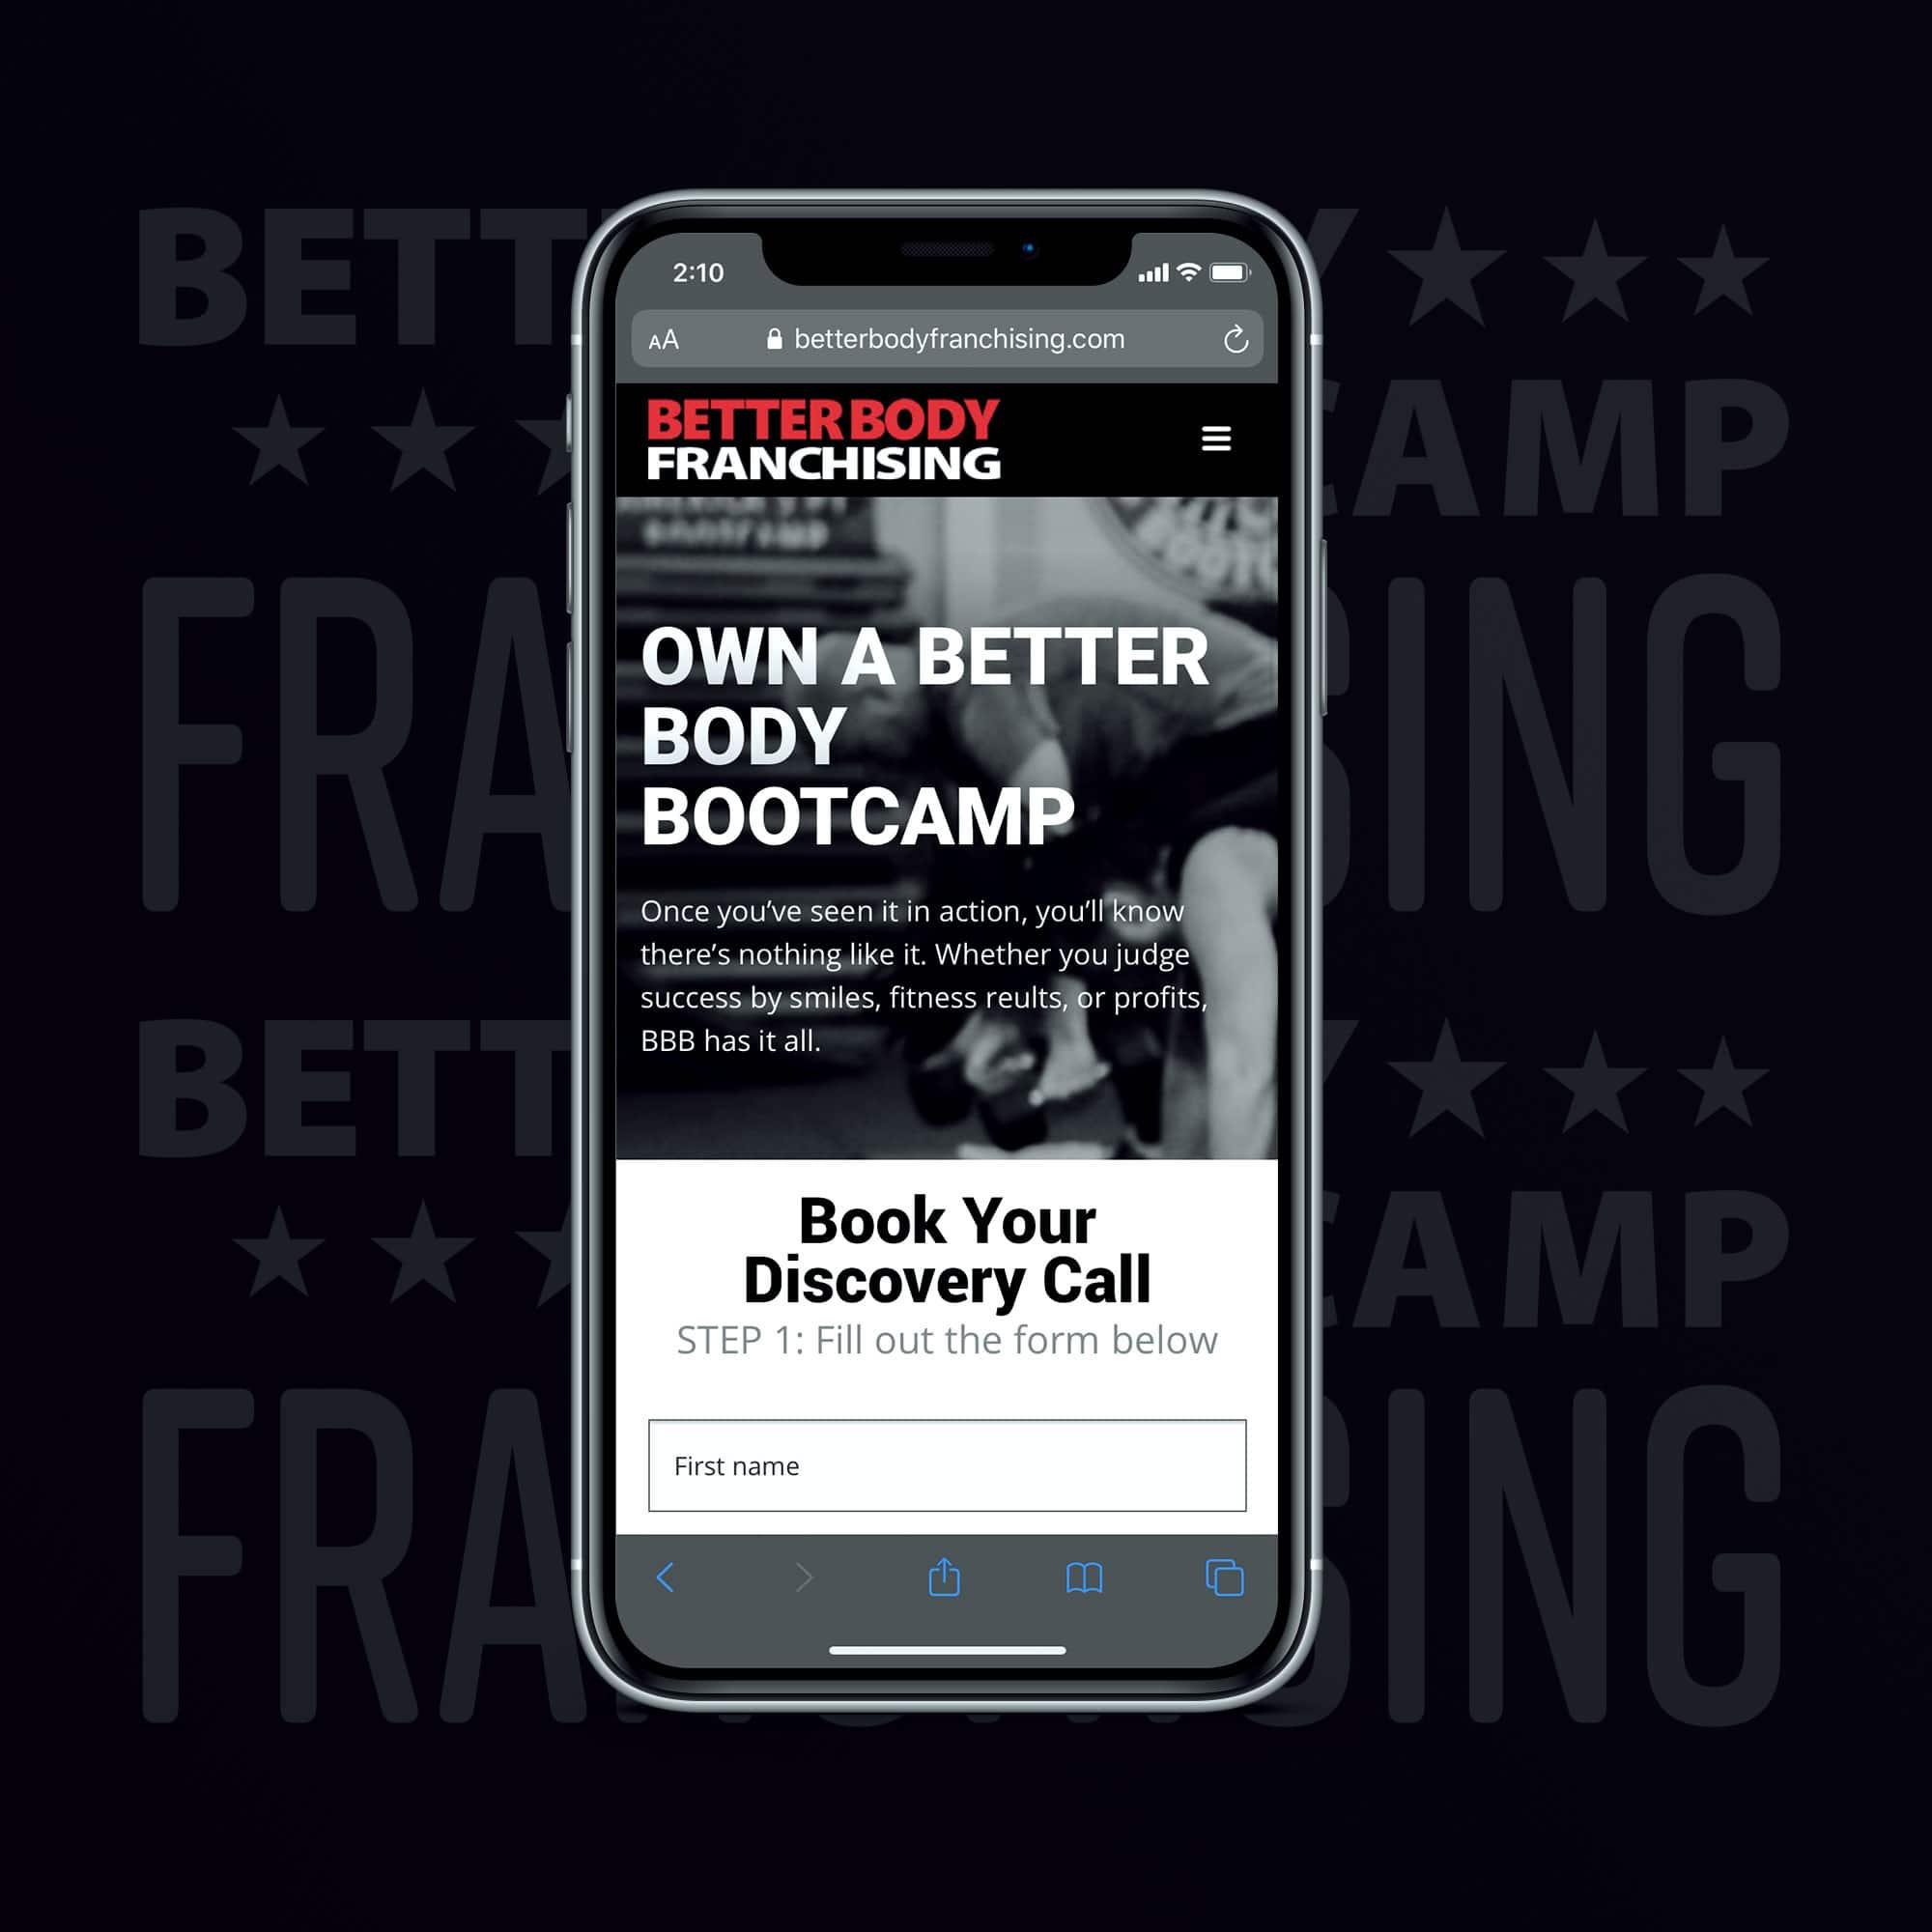 BetterBodyFranchising.com website design by JessMadeIt